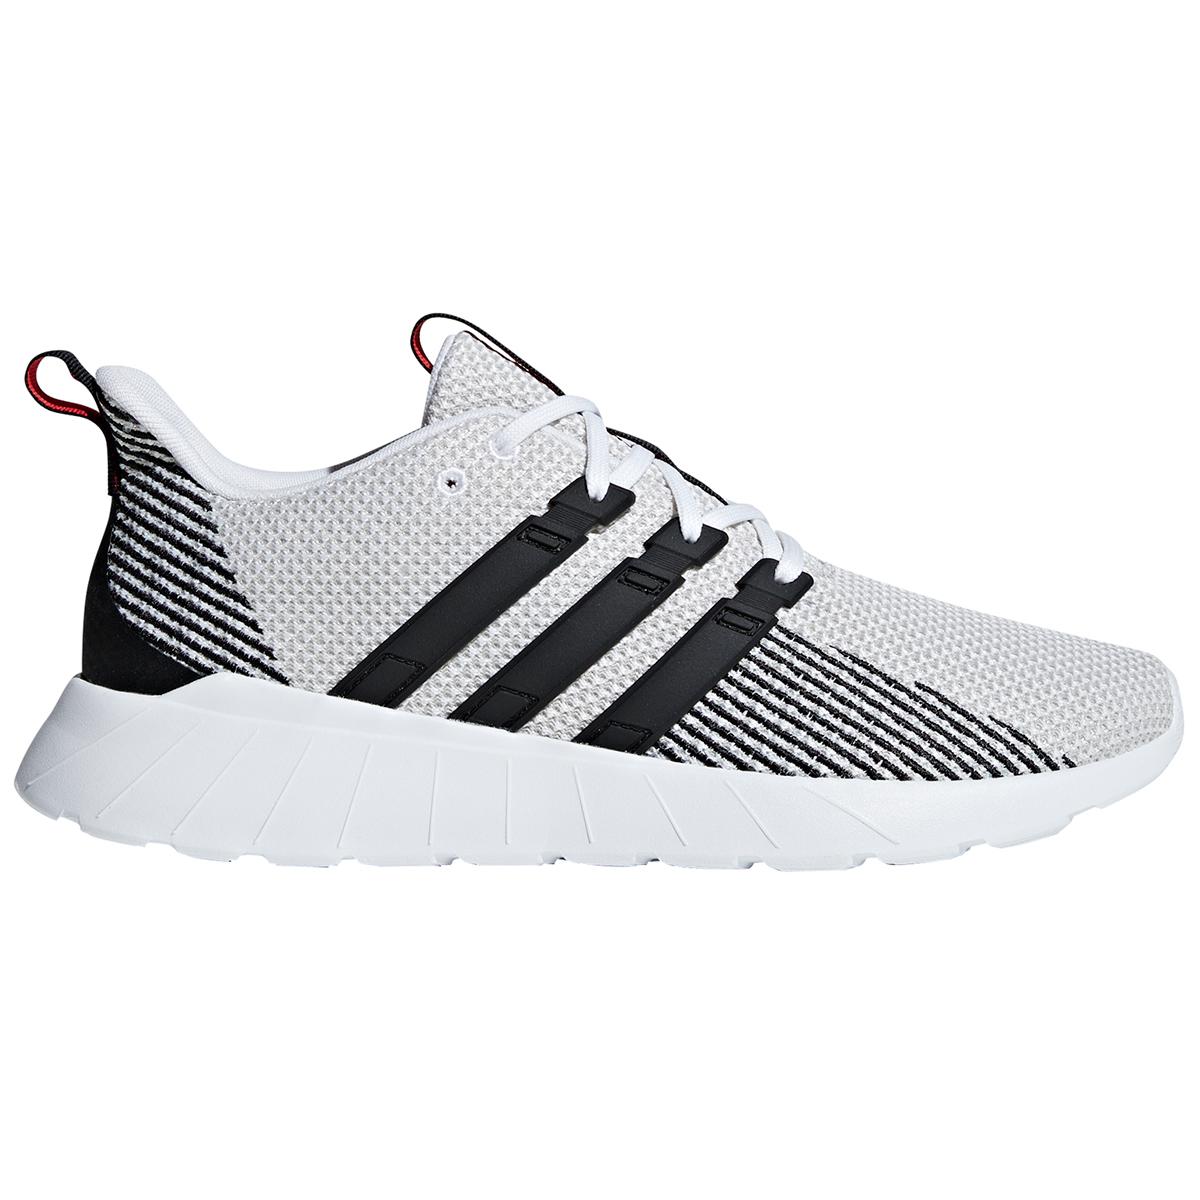 Adidas Men's Questar Flow Running Shoes - Black, 9.5